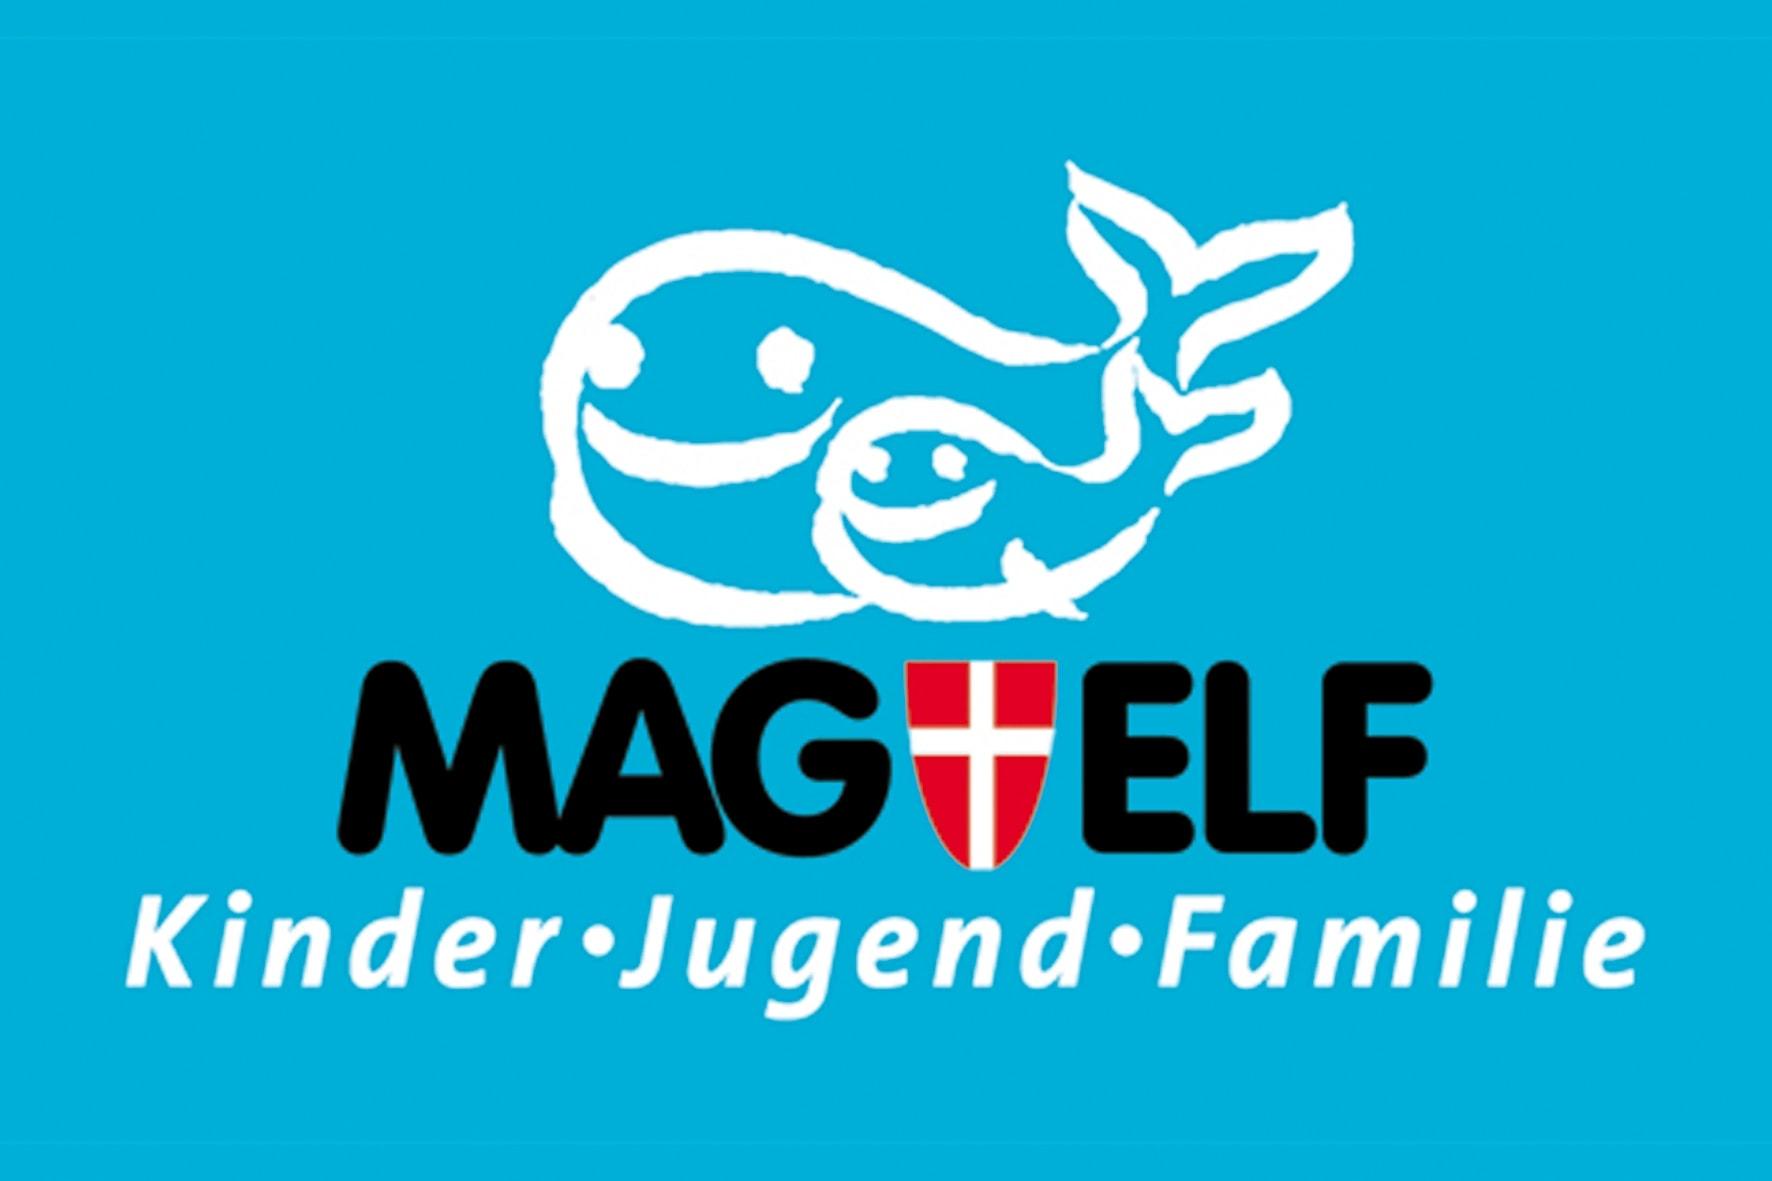 Stadt-Wien-Mag-11-logo_wal_300dpi